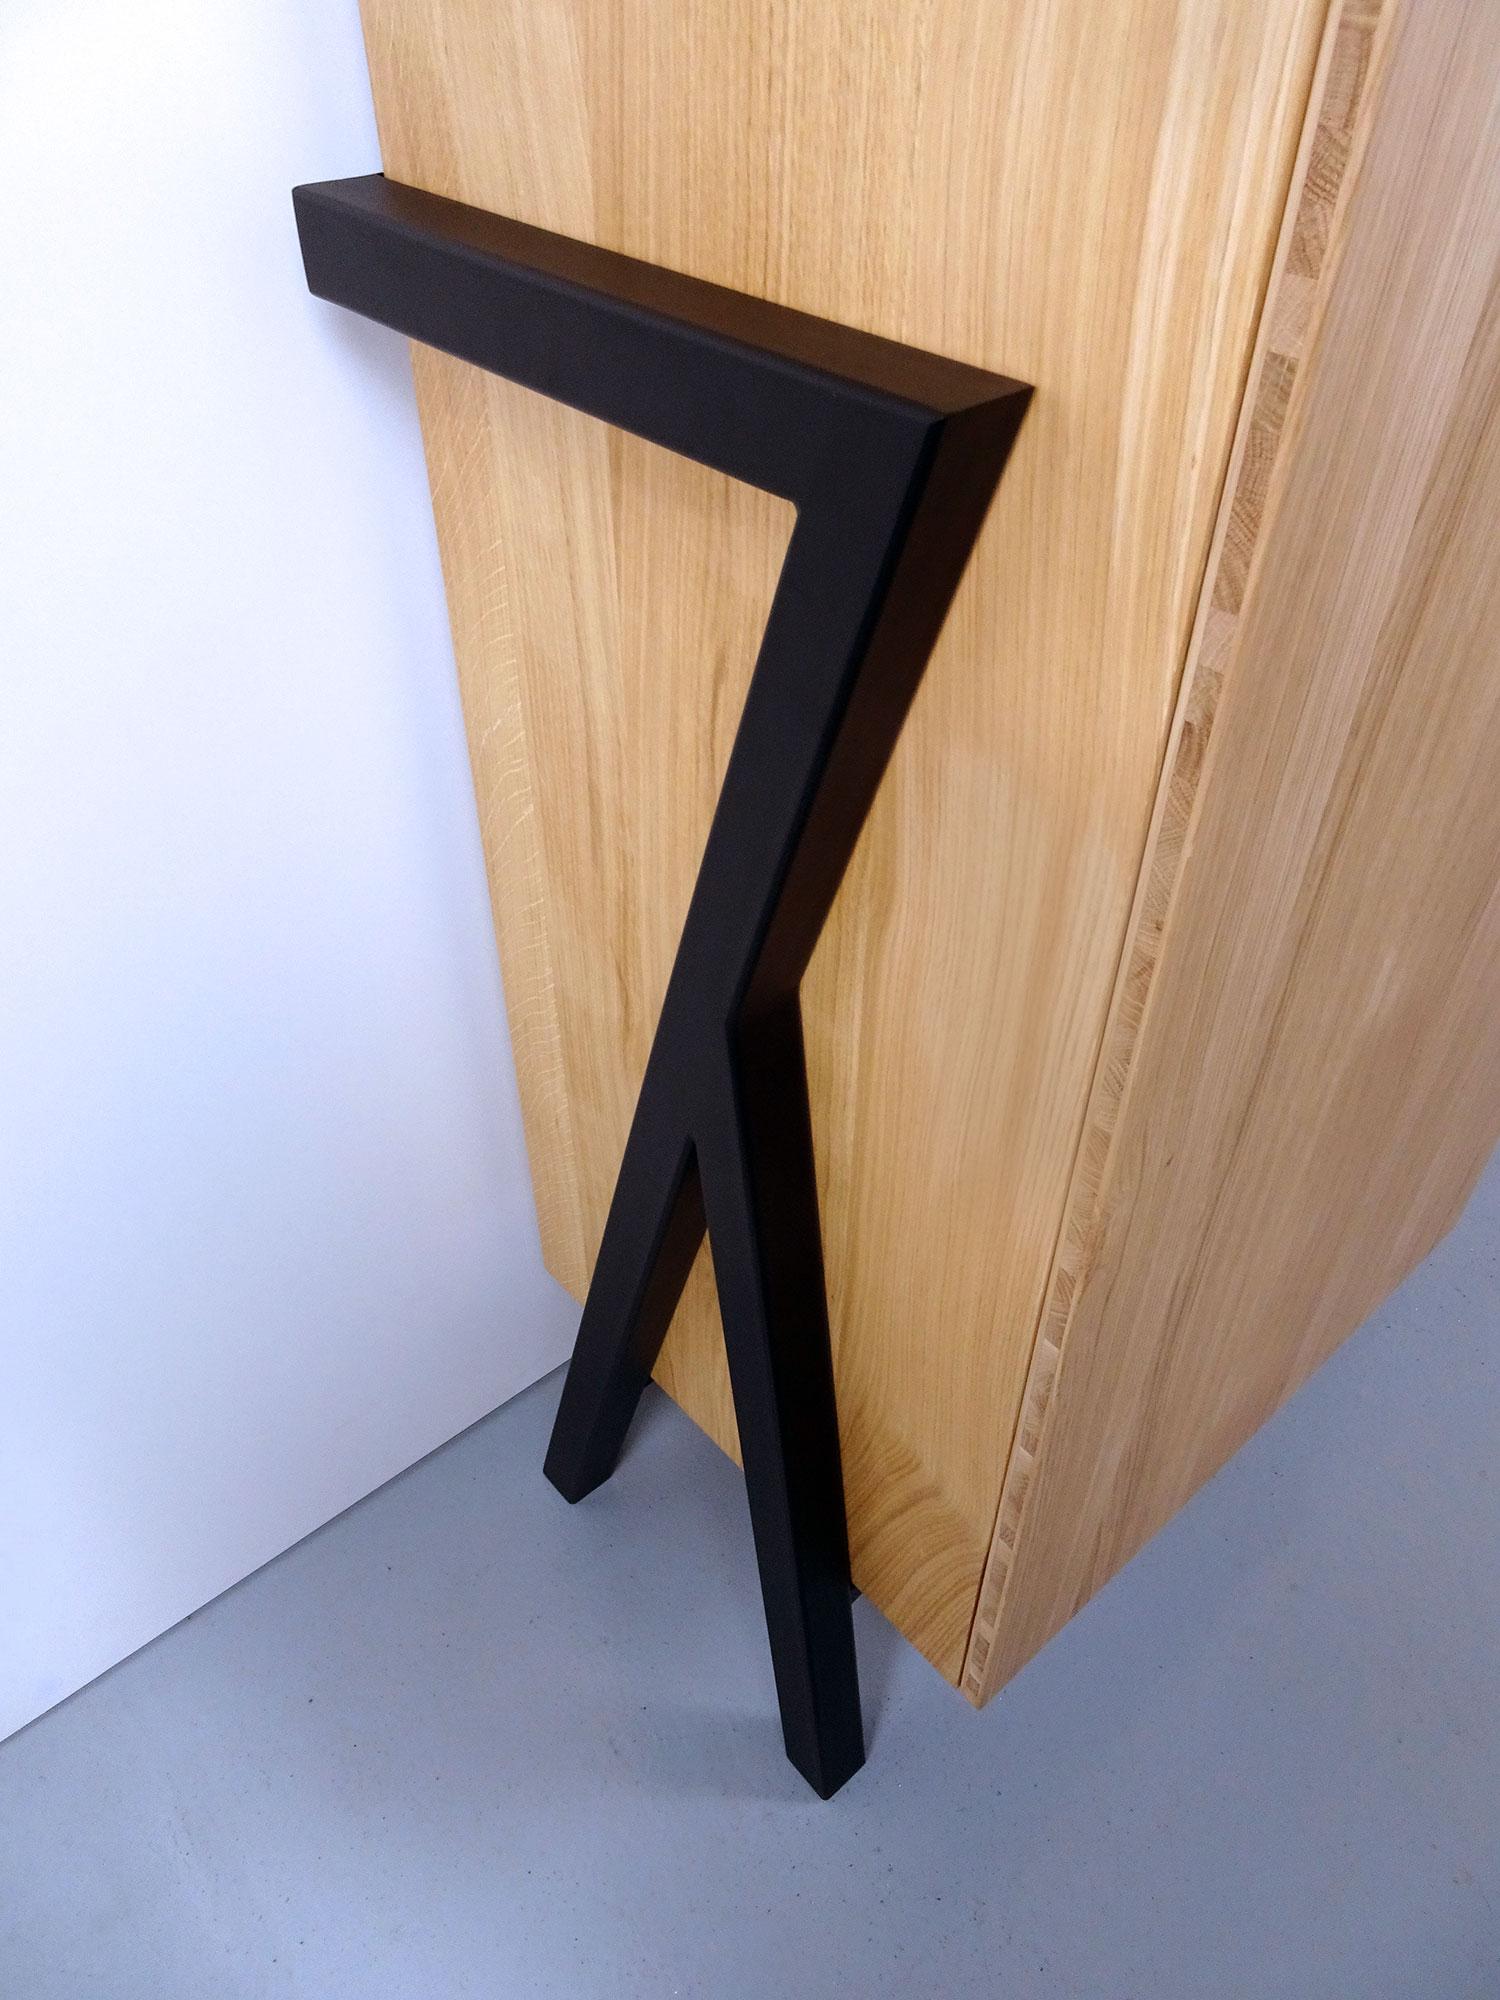 ARTMETA / Vitrine FLAMANT / Acier et bois massif / Fabrication sur mesure